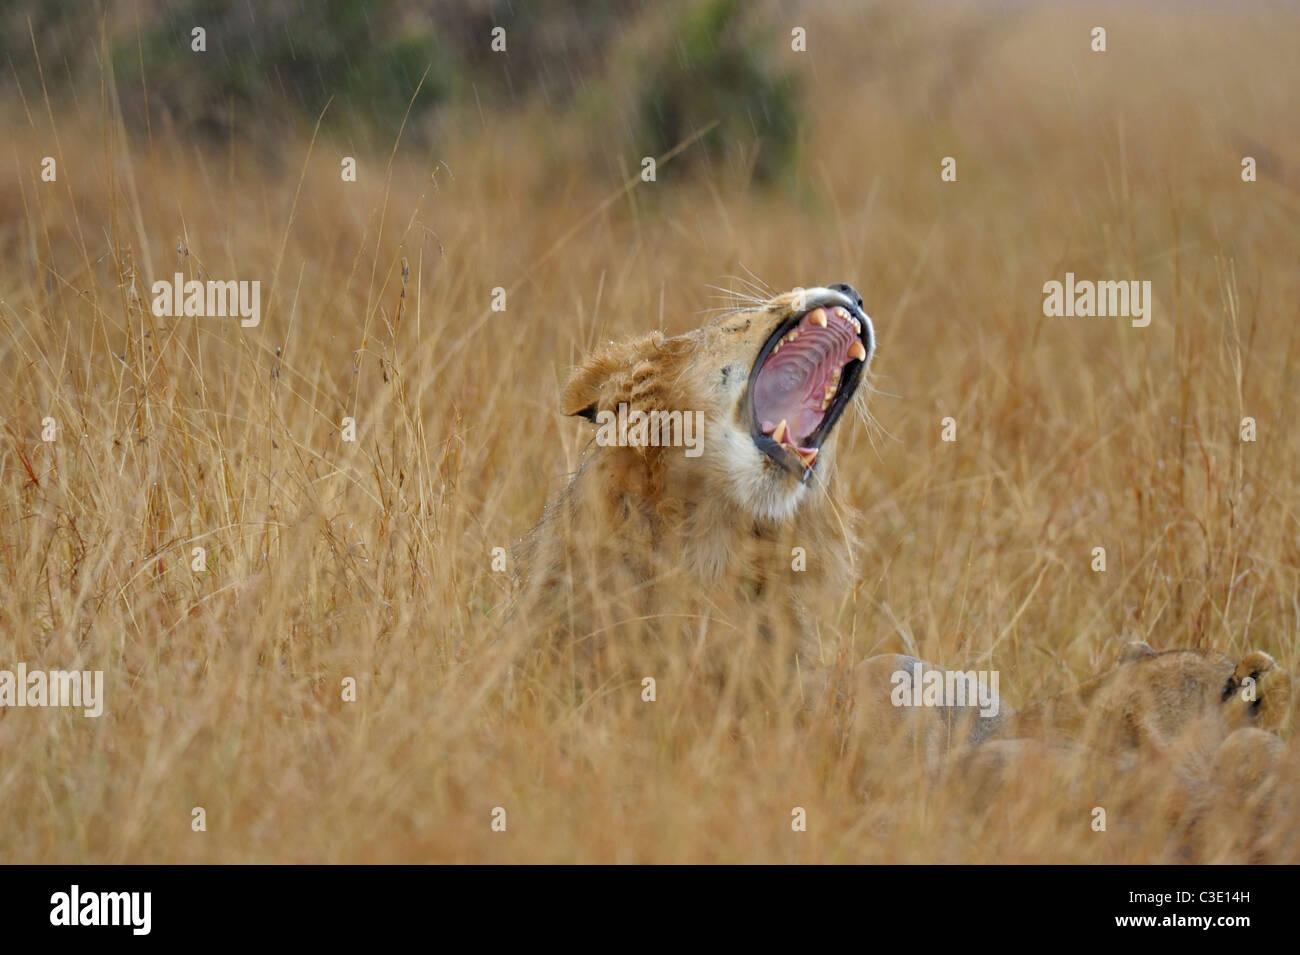 Male lion yawning in the grasses of Masai Mara, Kenya, Africa - Stock Image